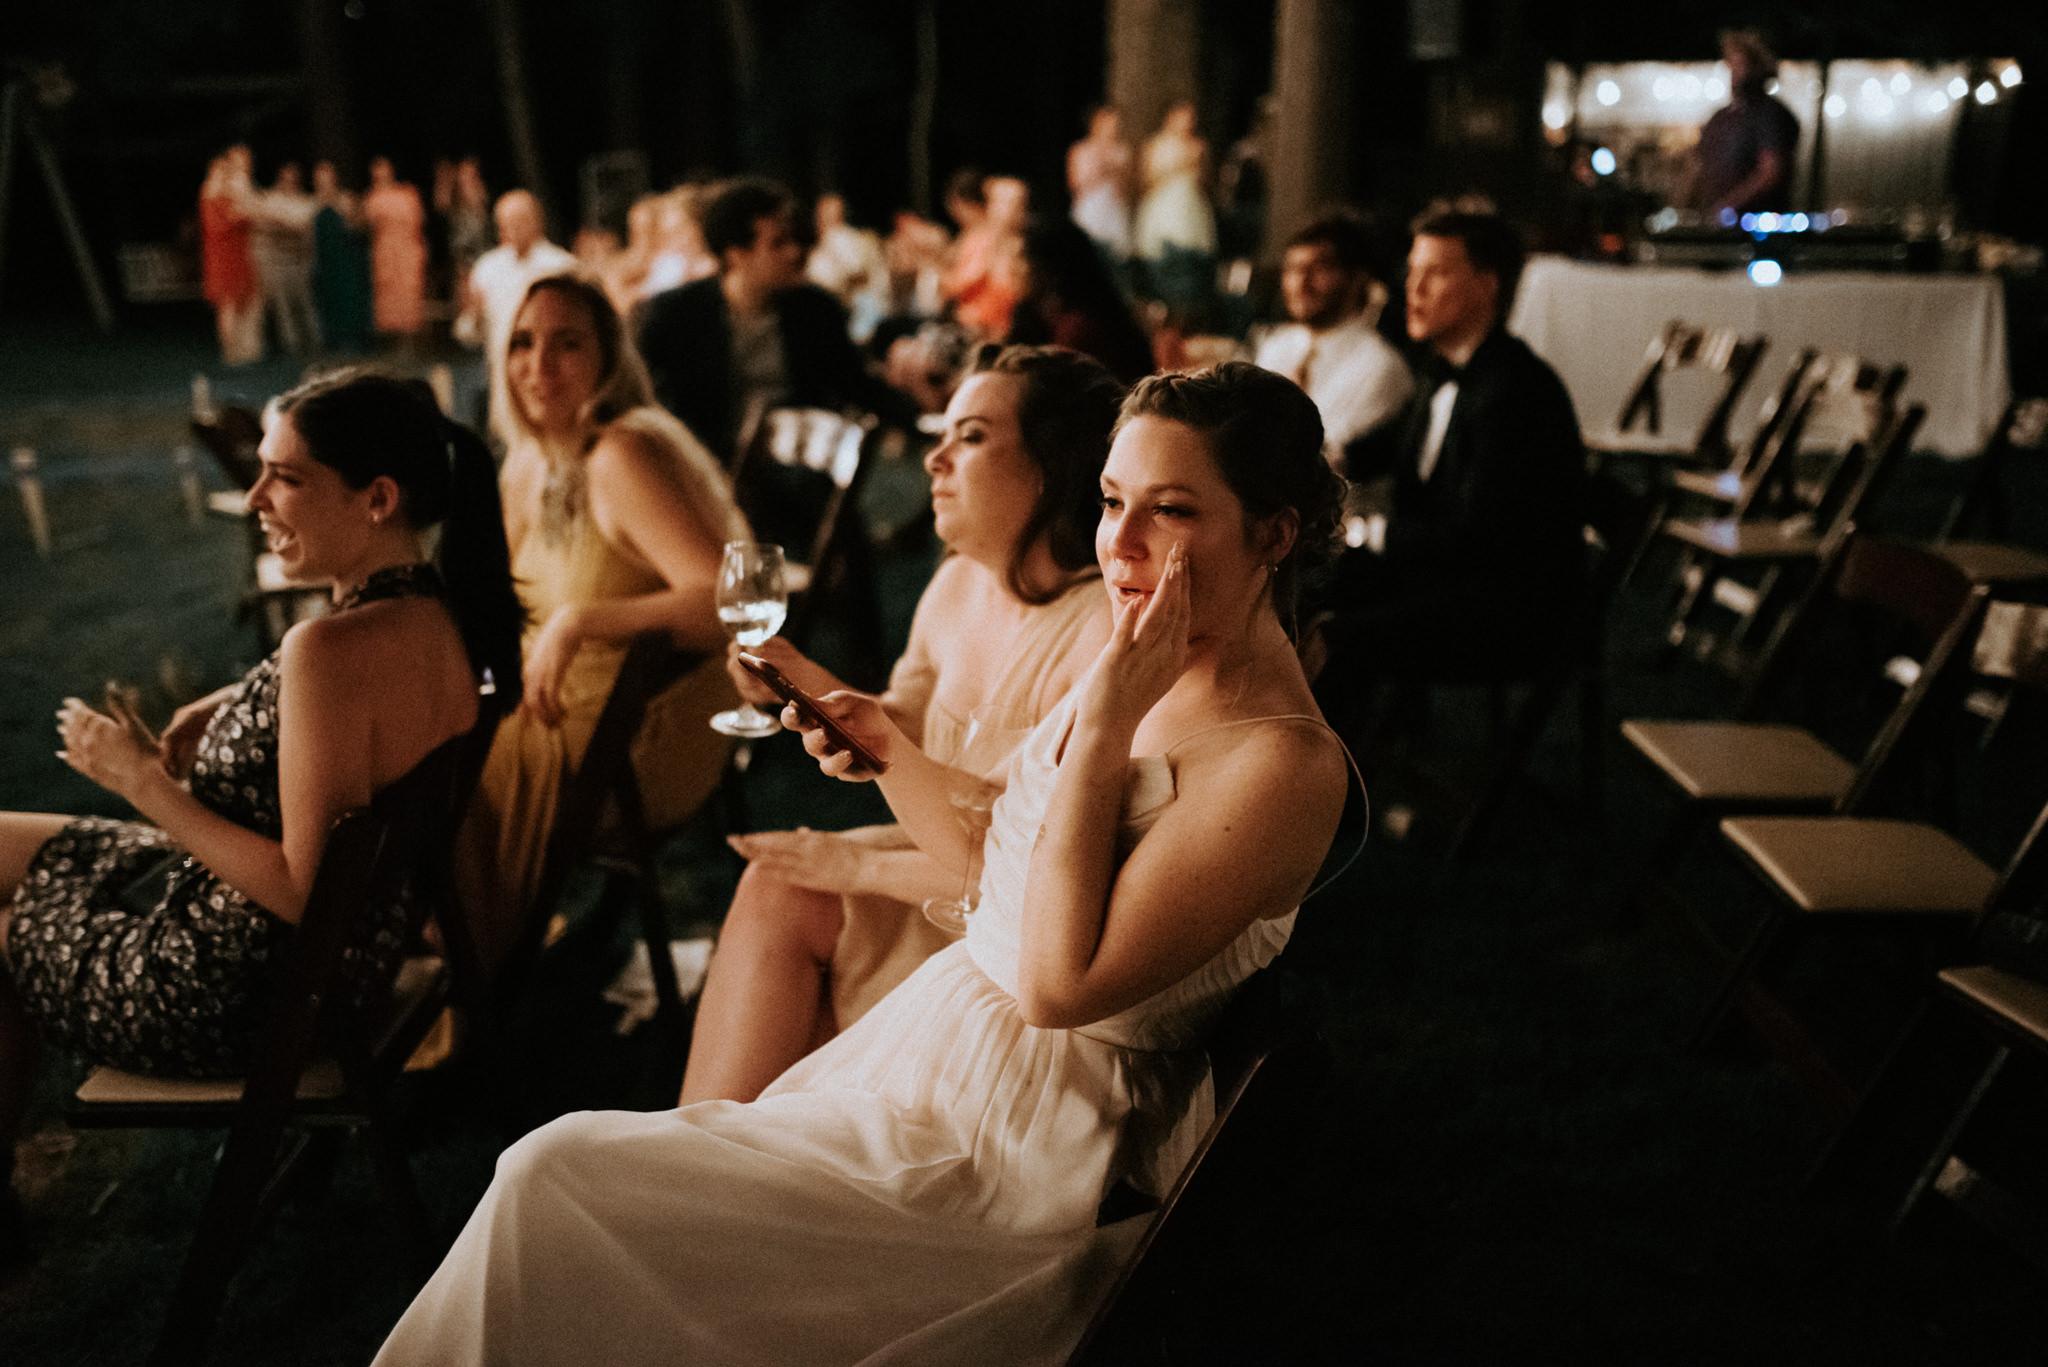 Kerlyn-Van-Gelder-Photography-Texas-Photographer621.jpgintimate-small-backyard-forest-wedding-nacogdoches-houston-wedding-photographer-kerlyn-van-gelder-photography